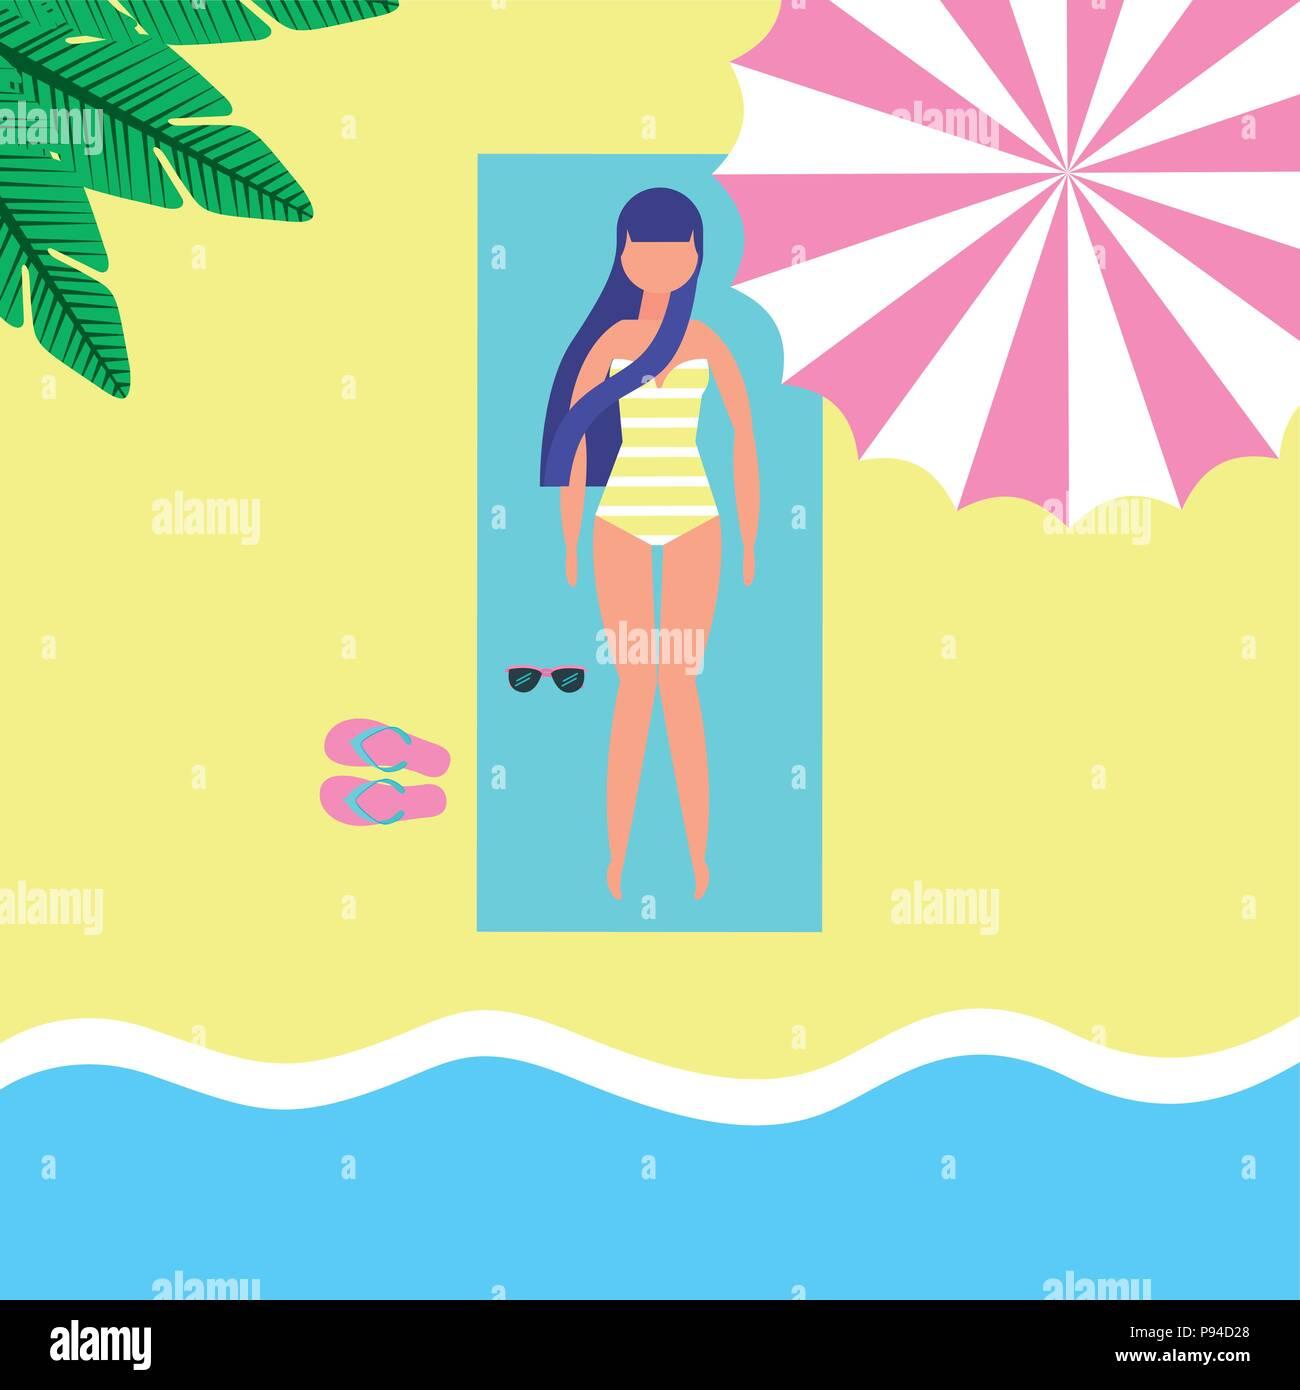 summer time sea beach umbrella girl lying down take a break vector illustration - Stock Vector